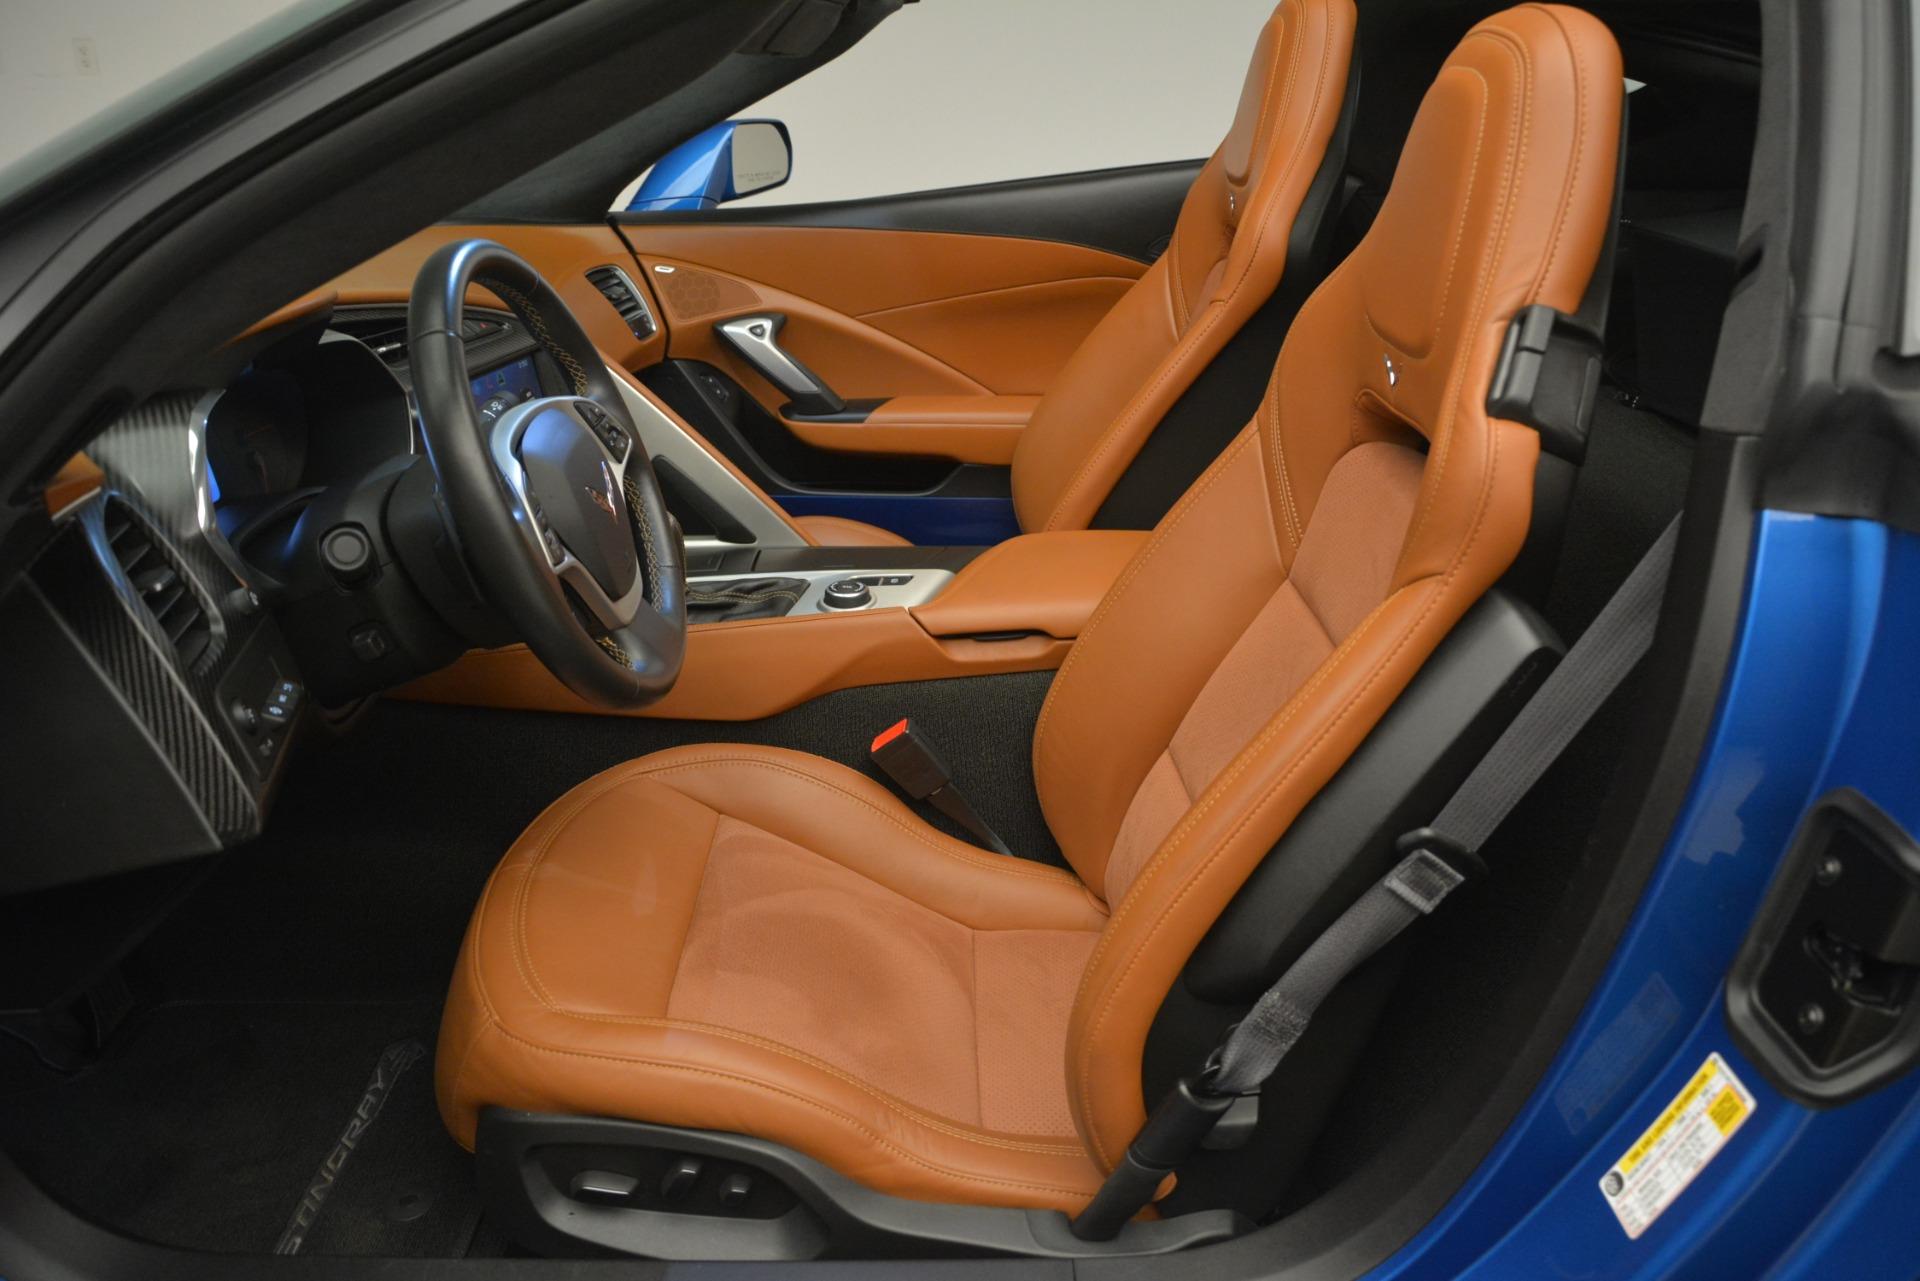 Used 2014 Chevrolet Corvette Stingray Z51 For Sale In Greenwich, CT 2703_p19